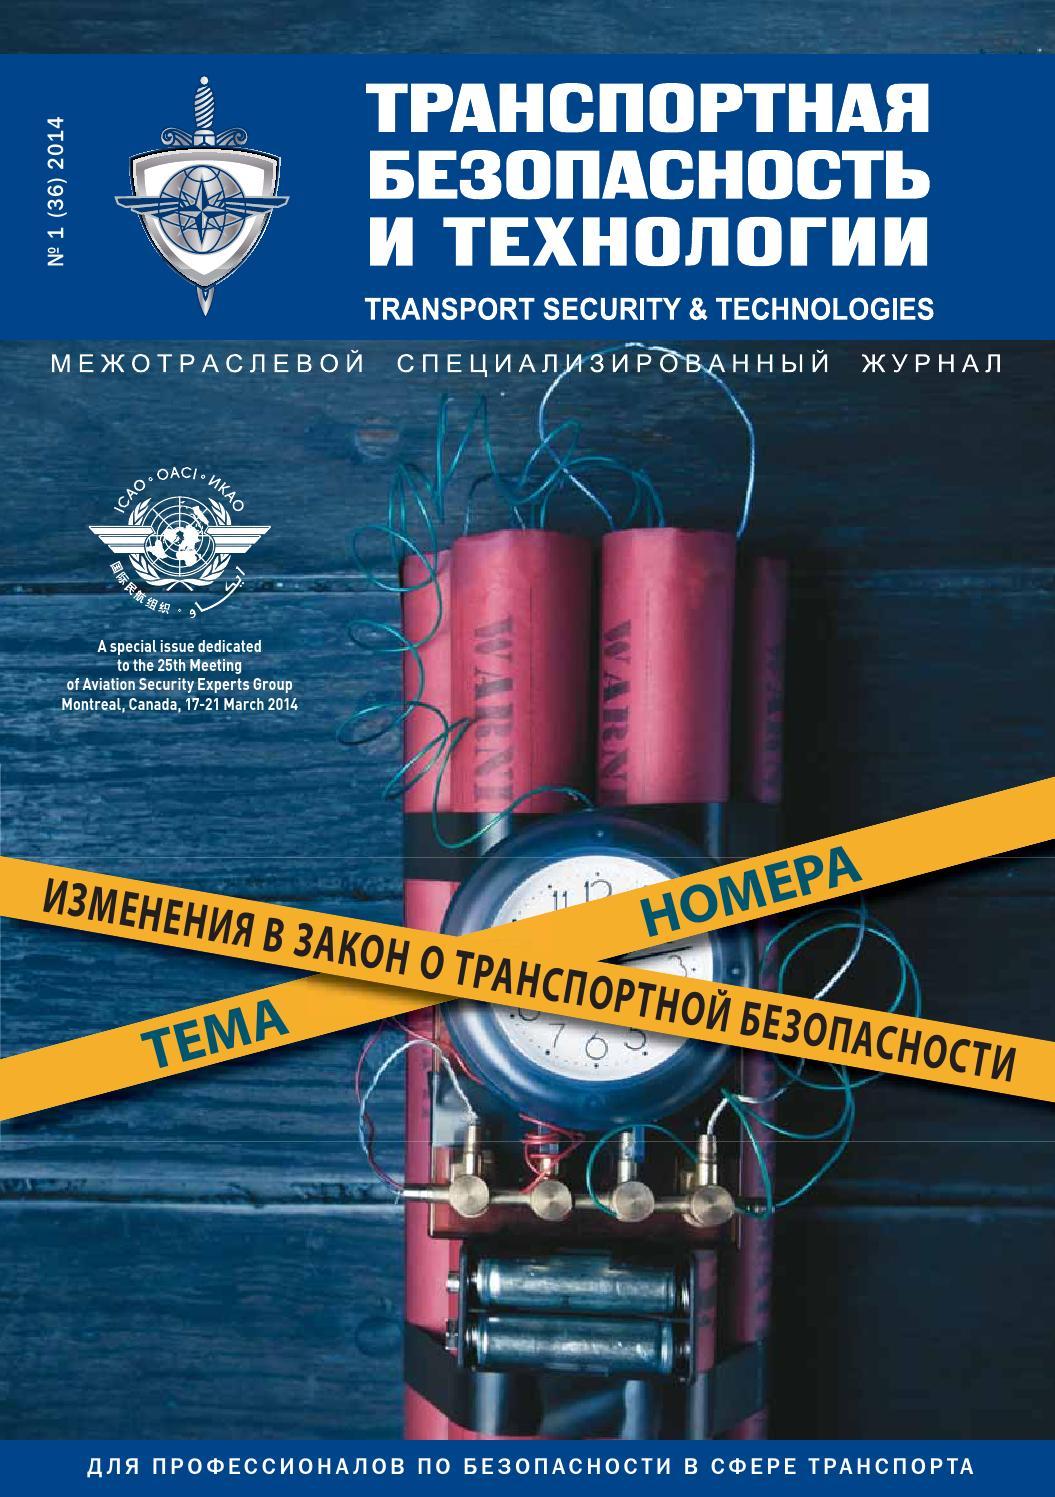 anpr access nedap avi инструкция на русском языке